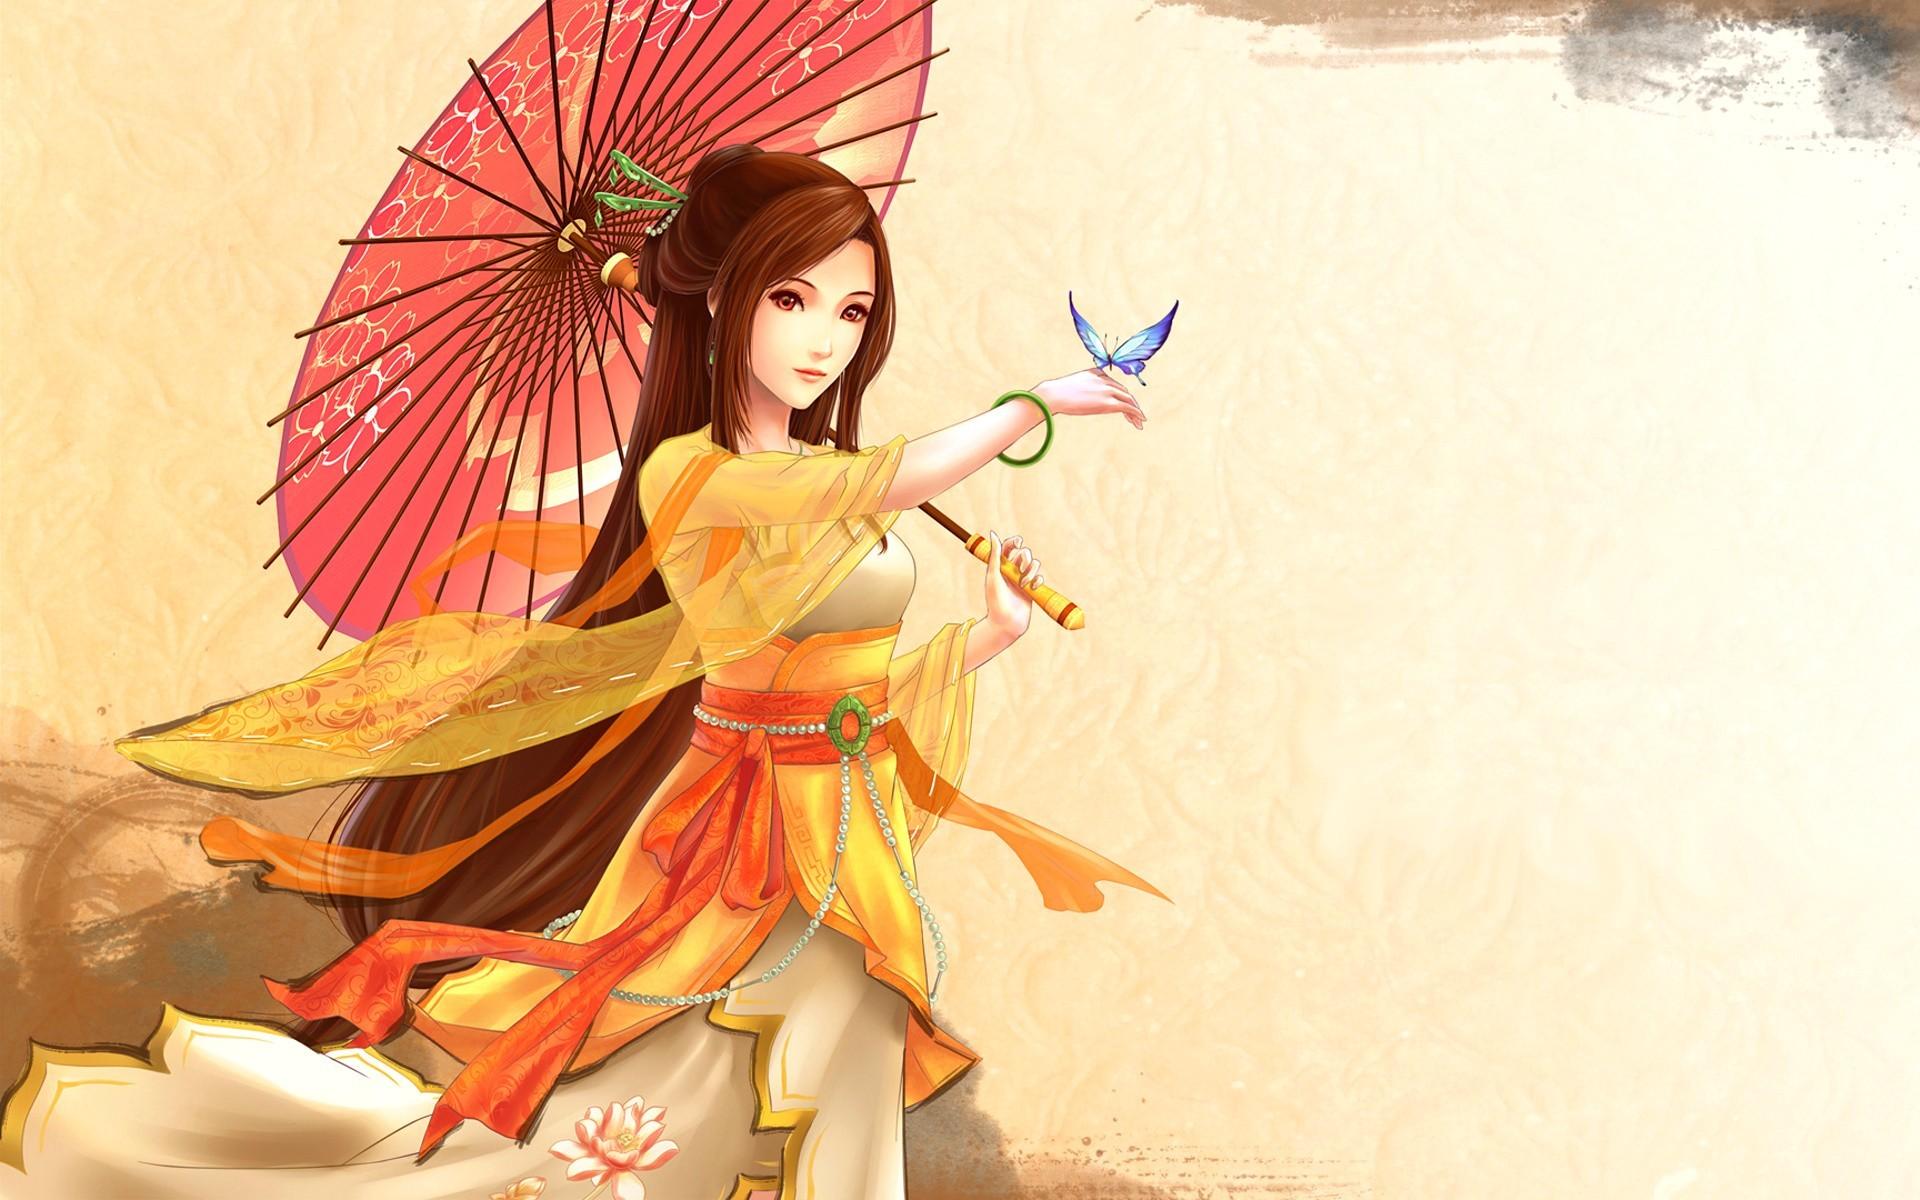 Anime 1920x1200 digital art parasol hairpin lotus flowers anime anime girls fantasy art fantasy girl umbrella animals insect butterfly redhead long hair dress yellow dress simple background